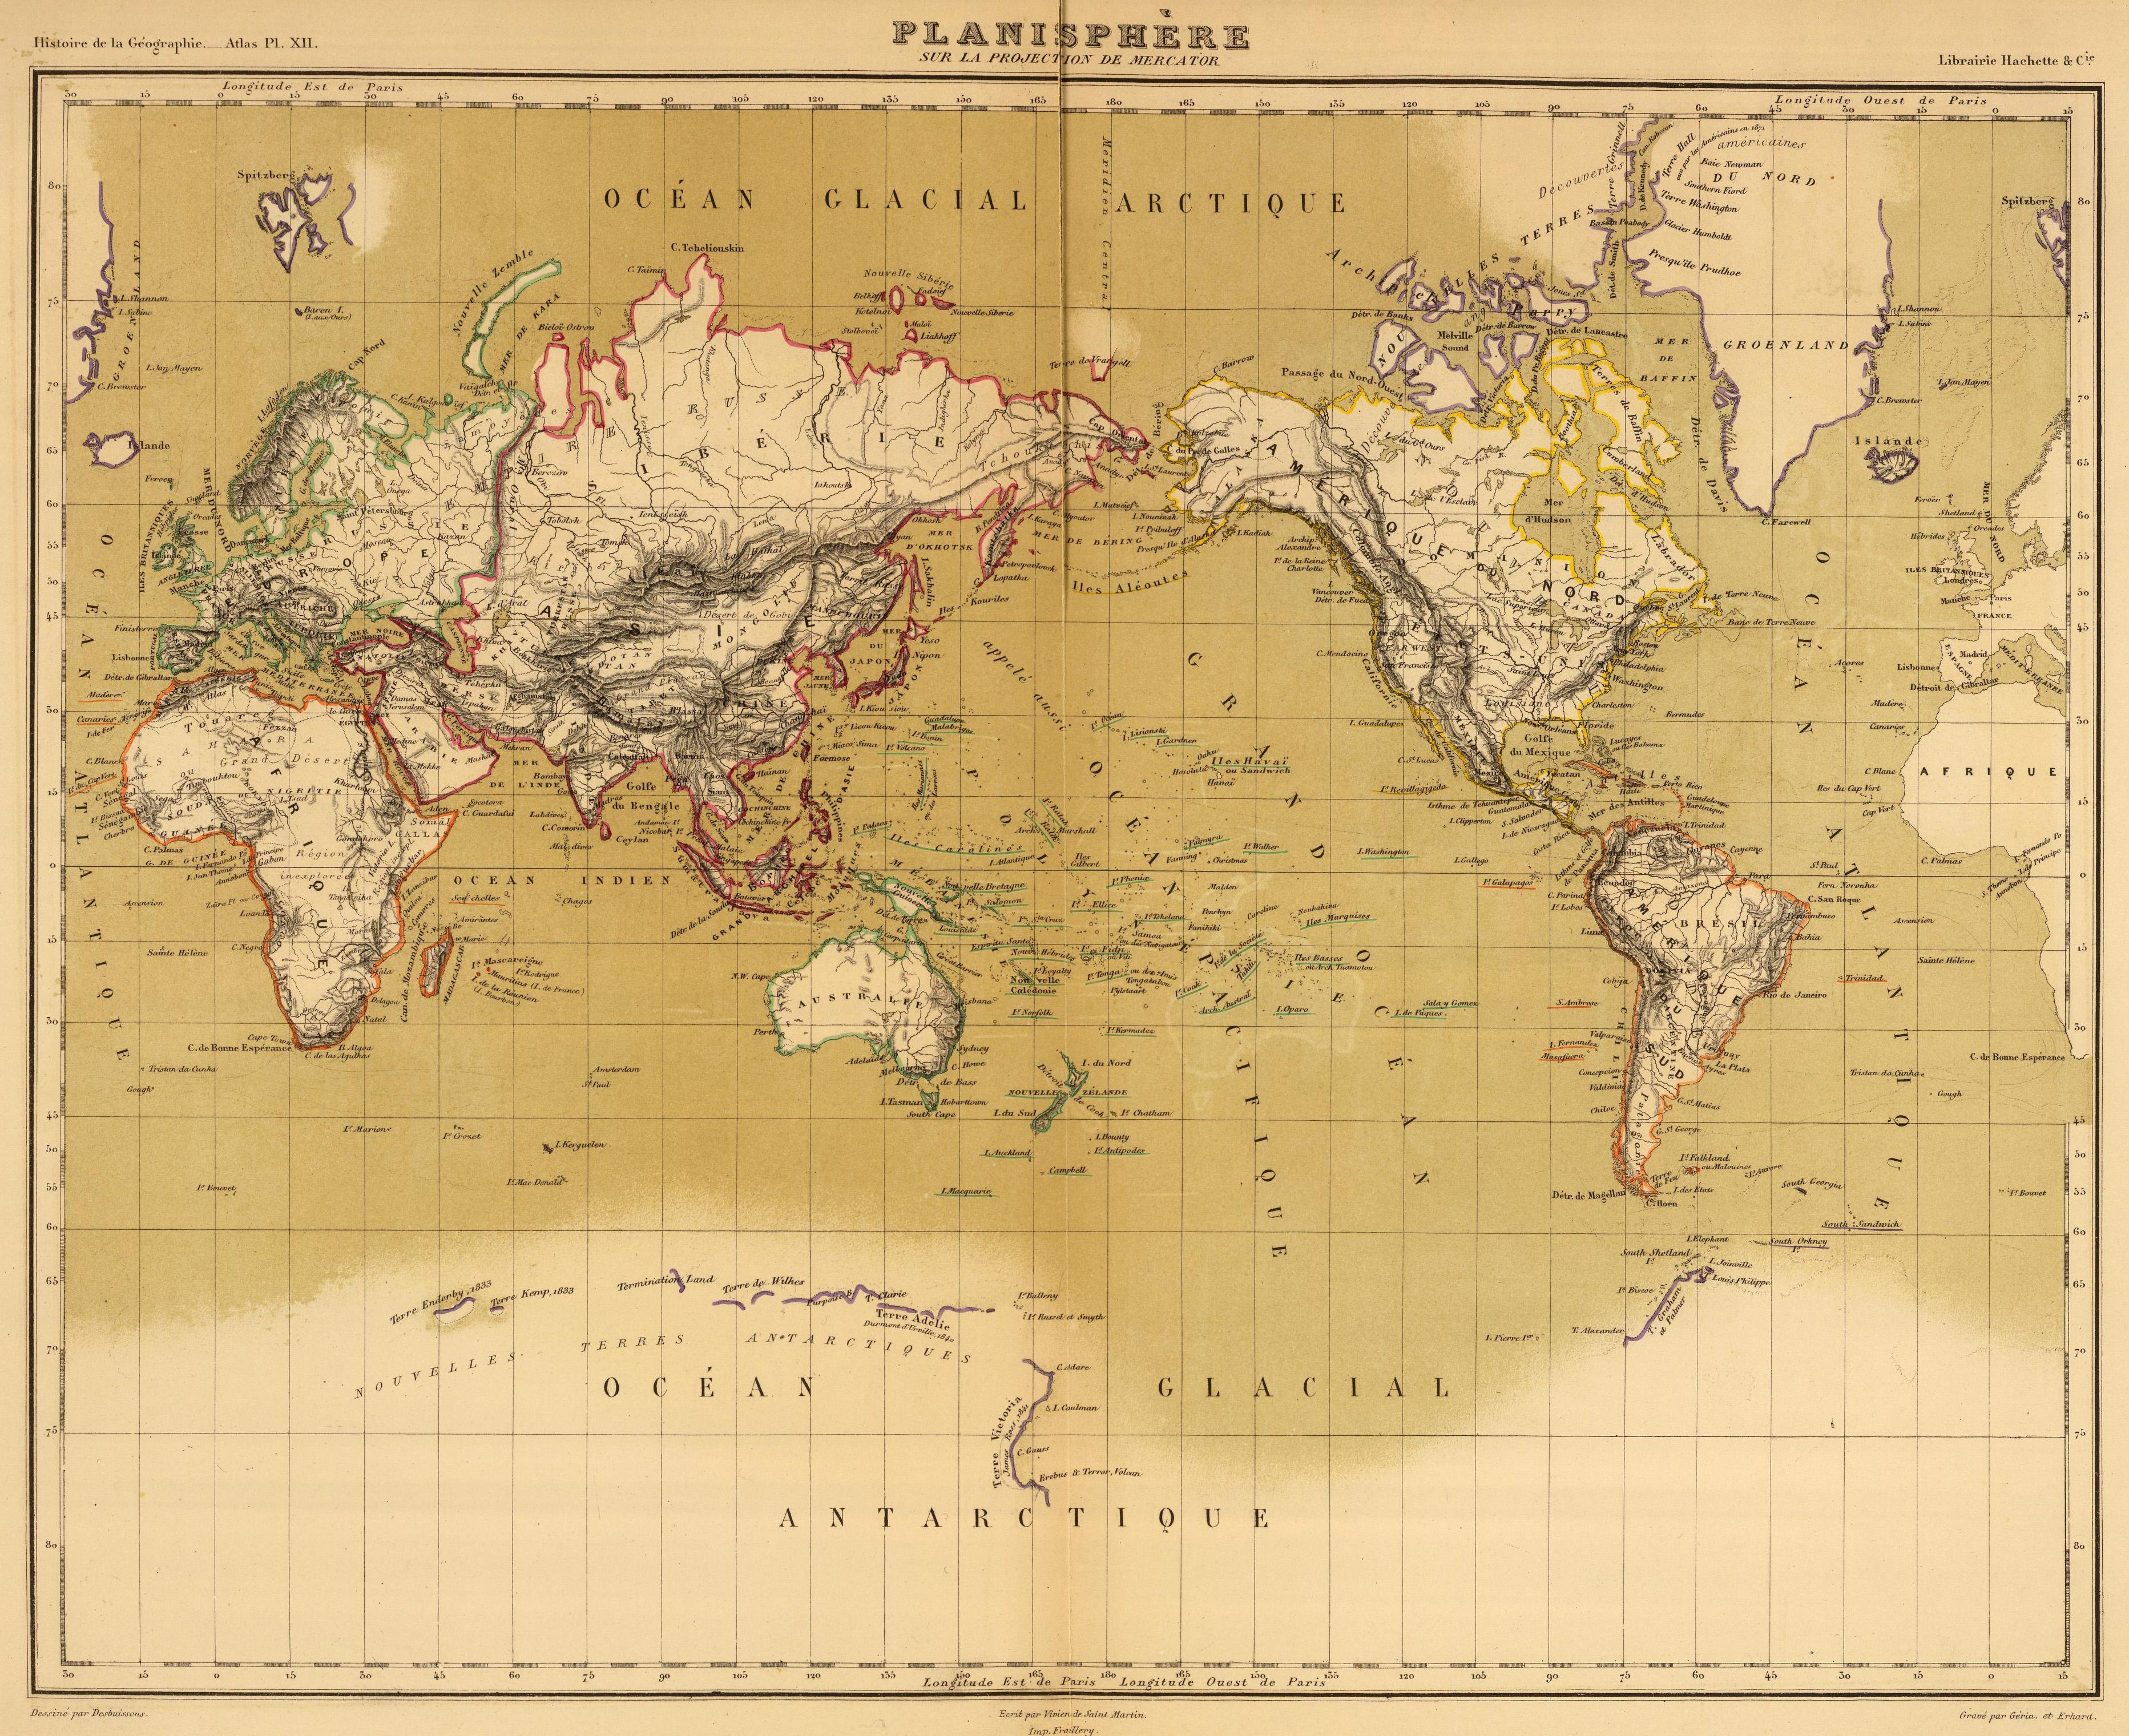 Vivien de Saint-Martin_1874_Planisphere